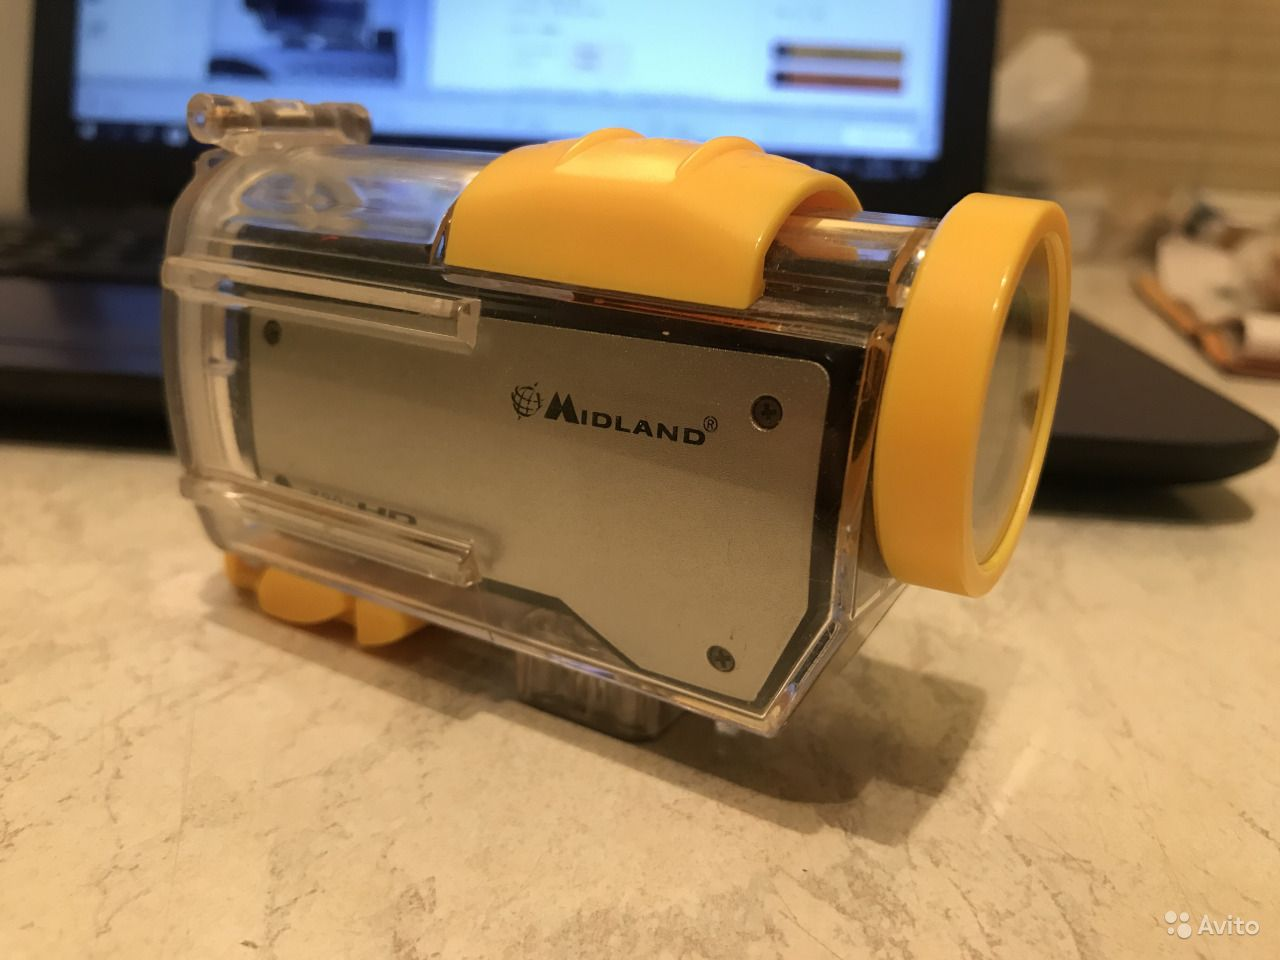 midland camcorders manuals